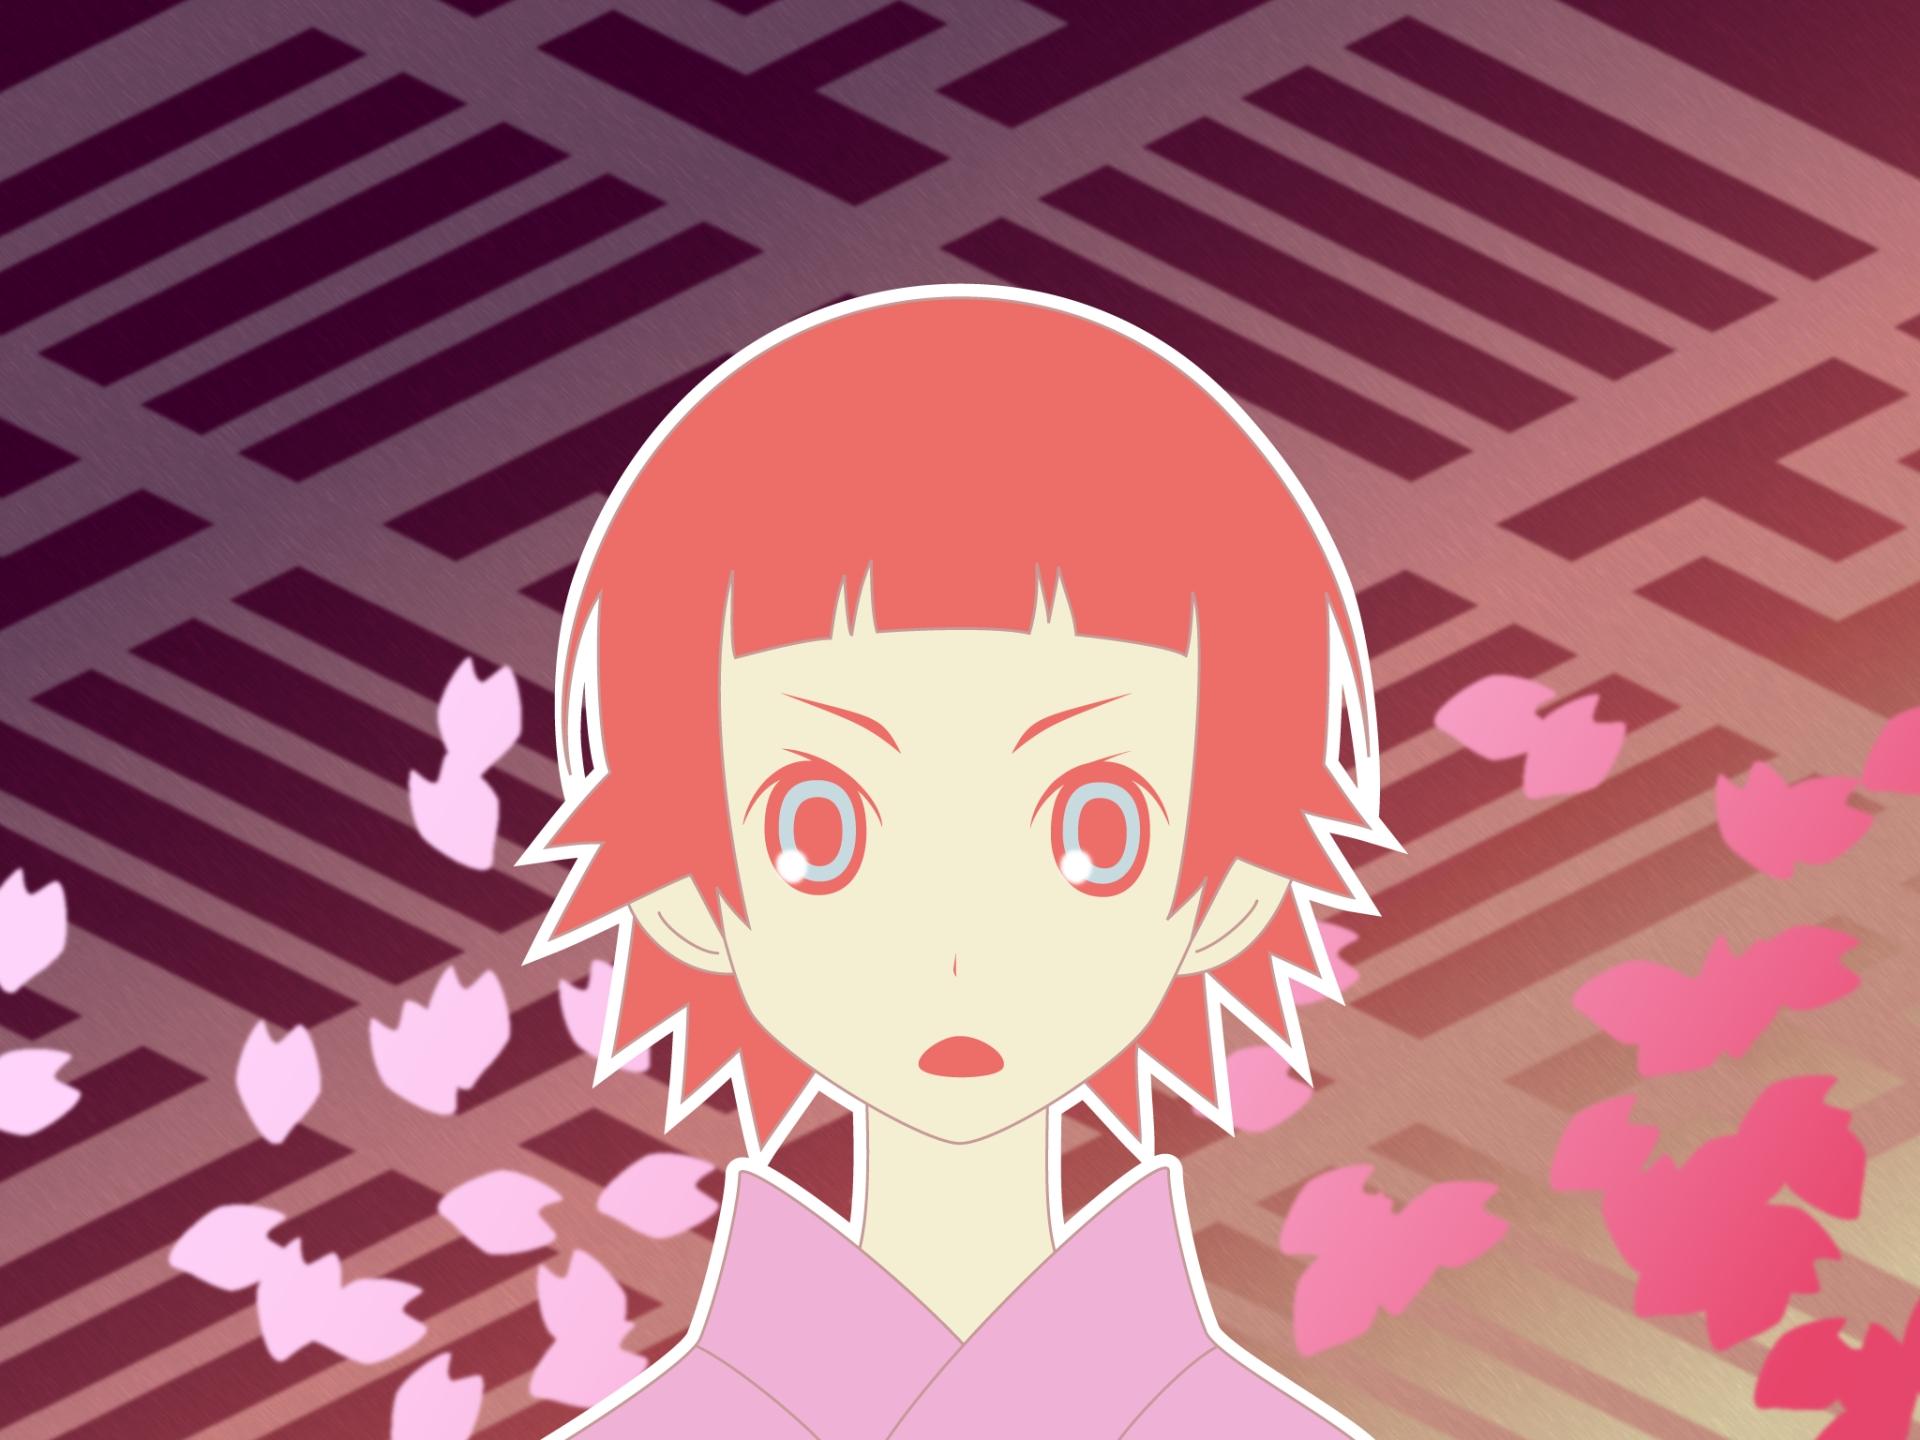 Sayonara Zetsubou Sensei Hd Wallpaper Background Image 19x1440 Id Wallpaper Abyss